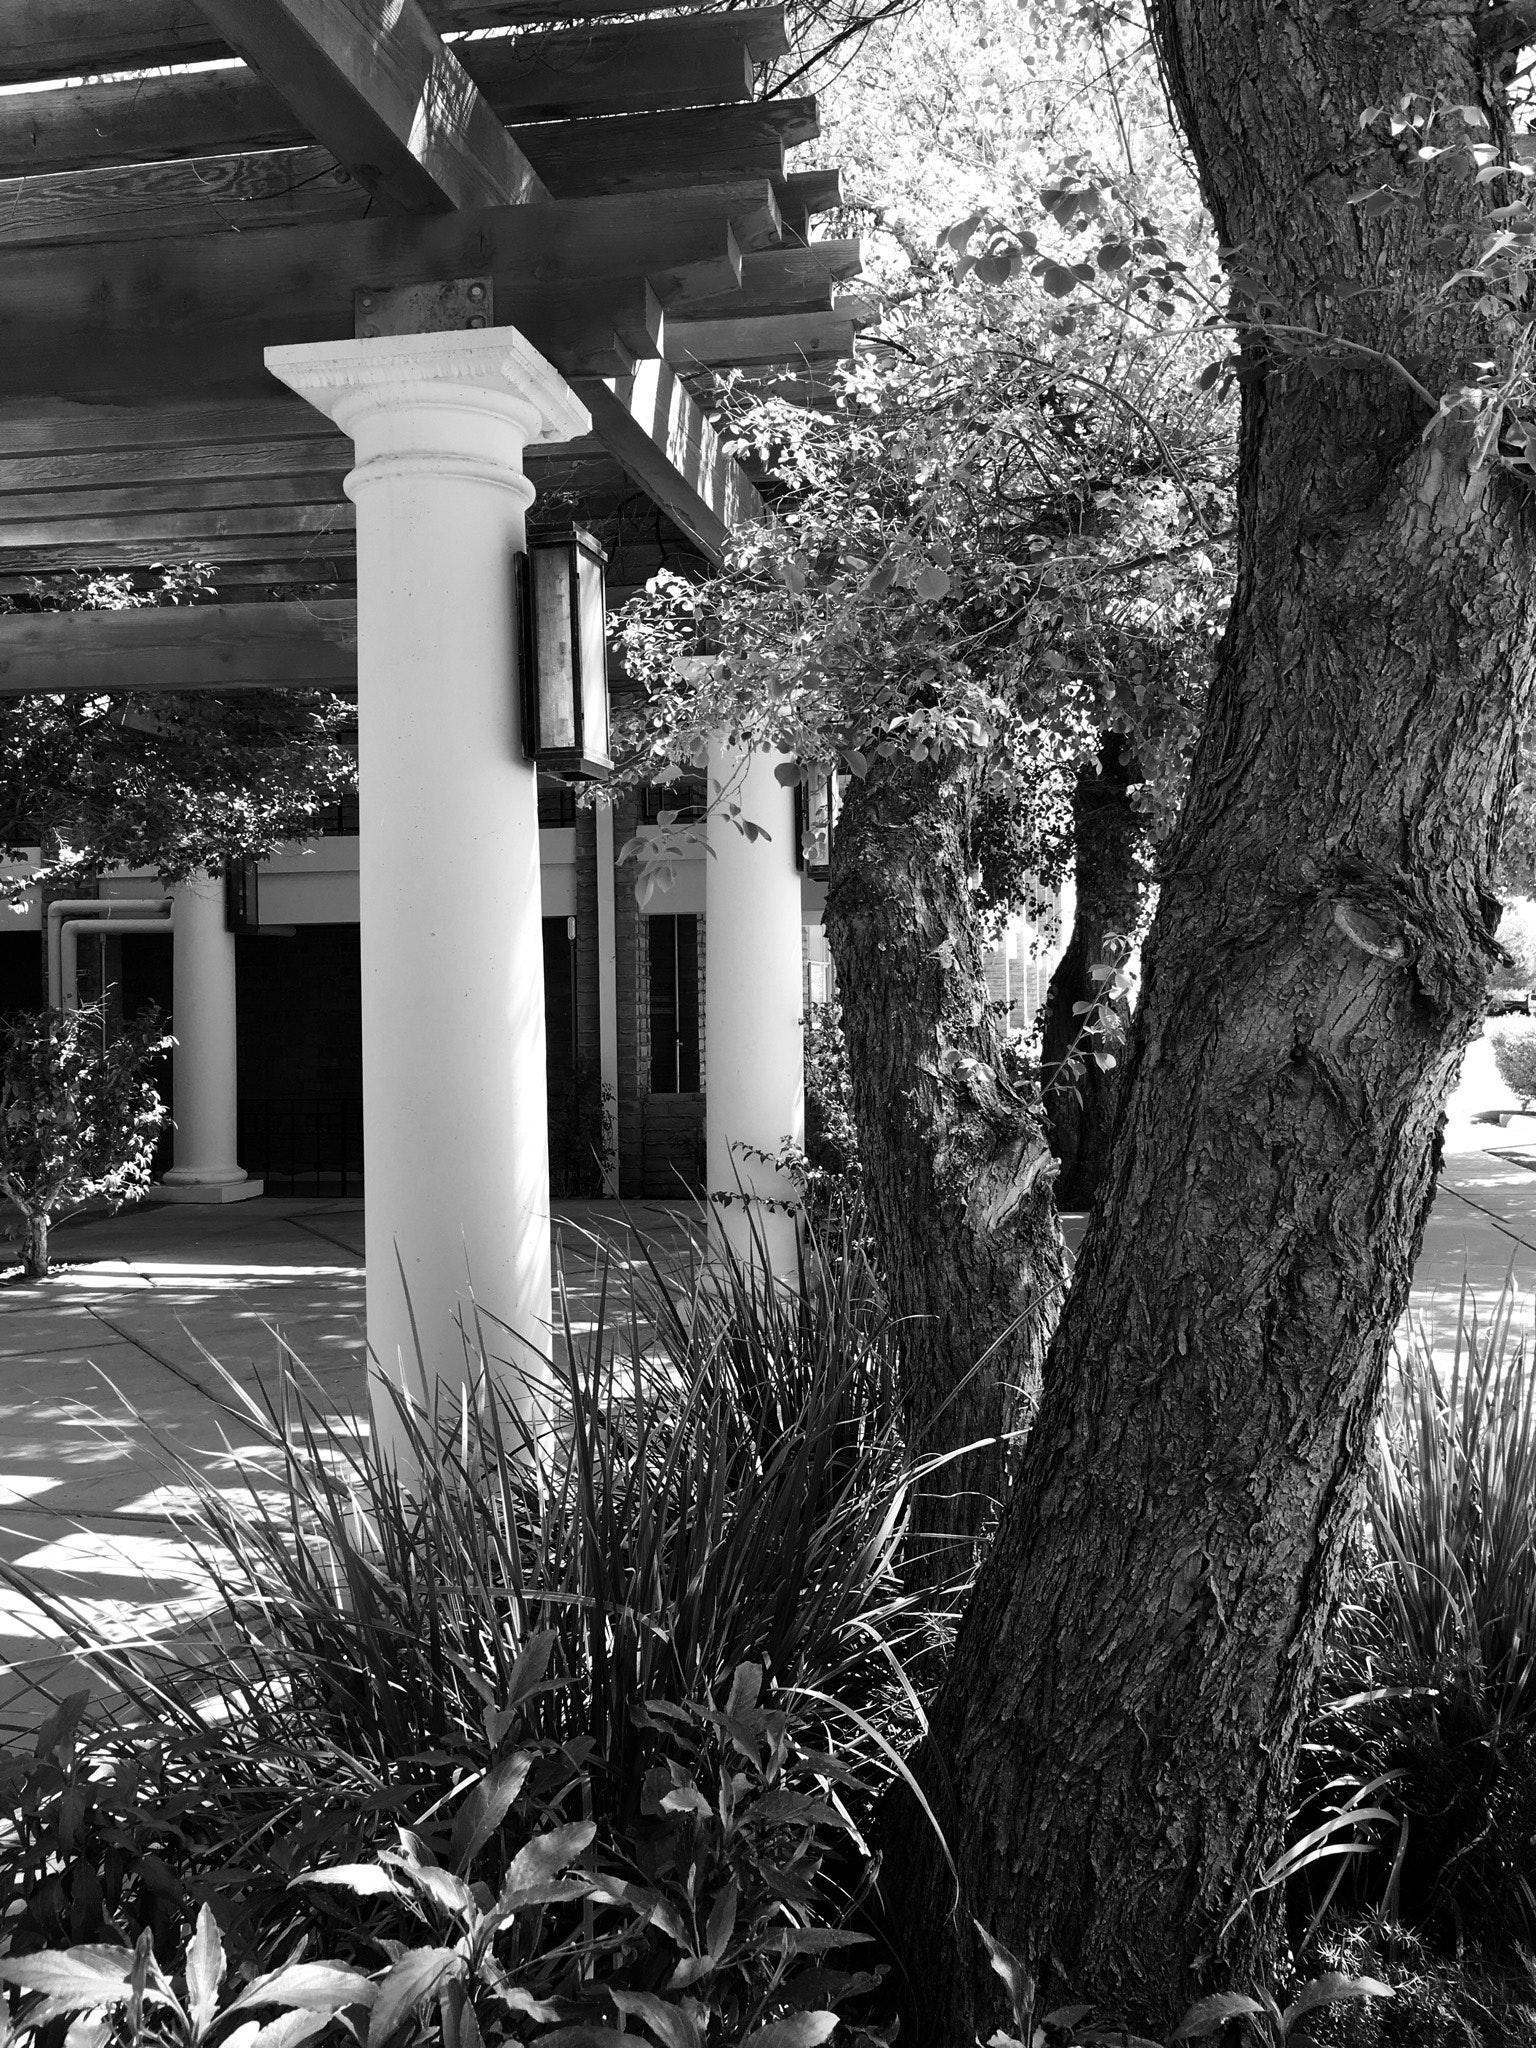 Free stock photo of black and white, patio, trees